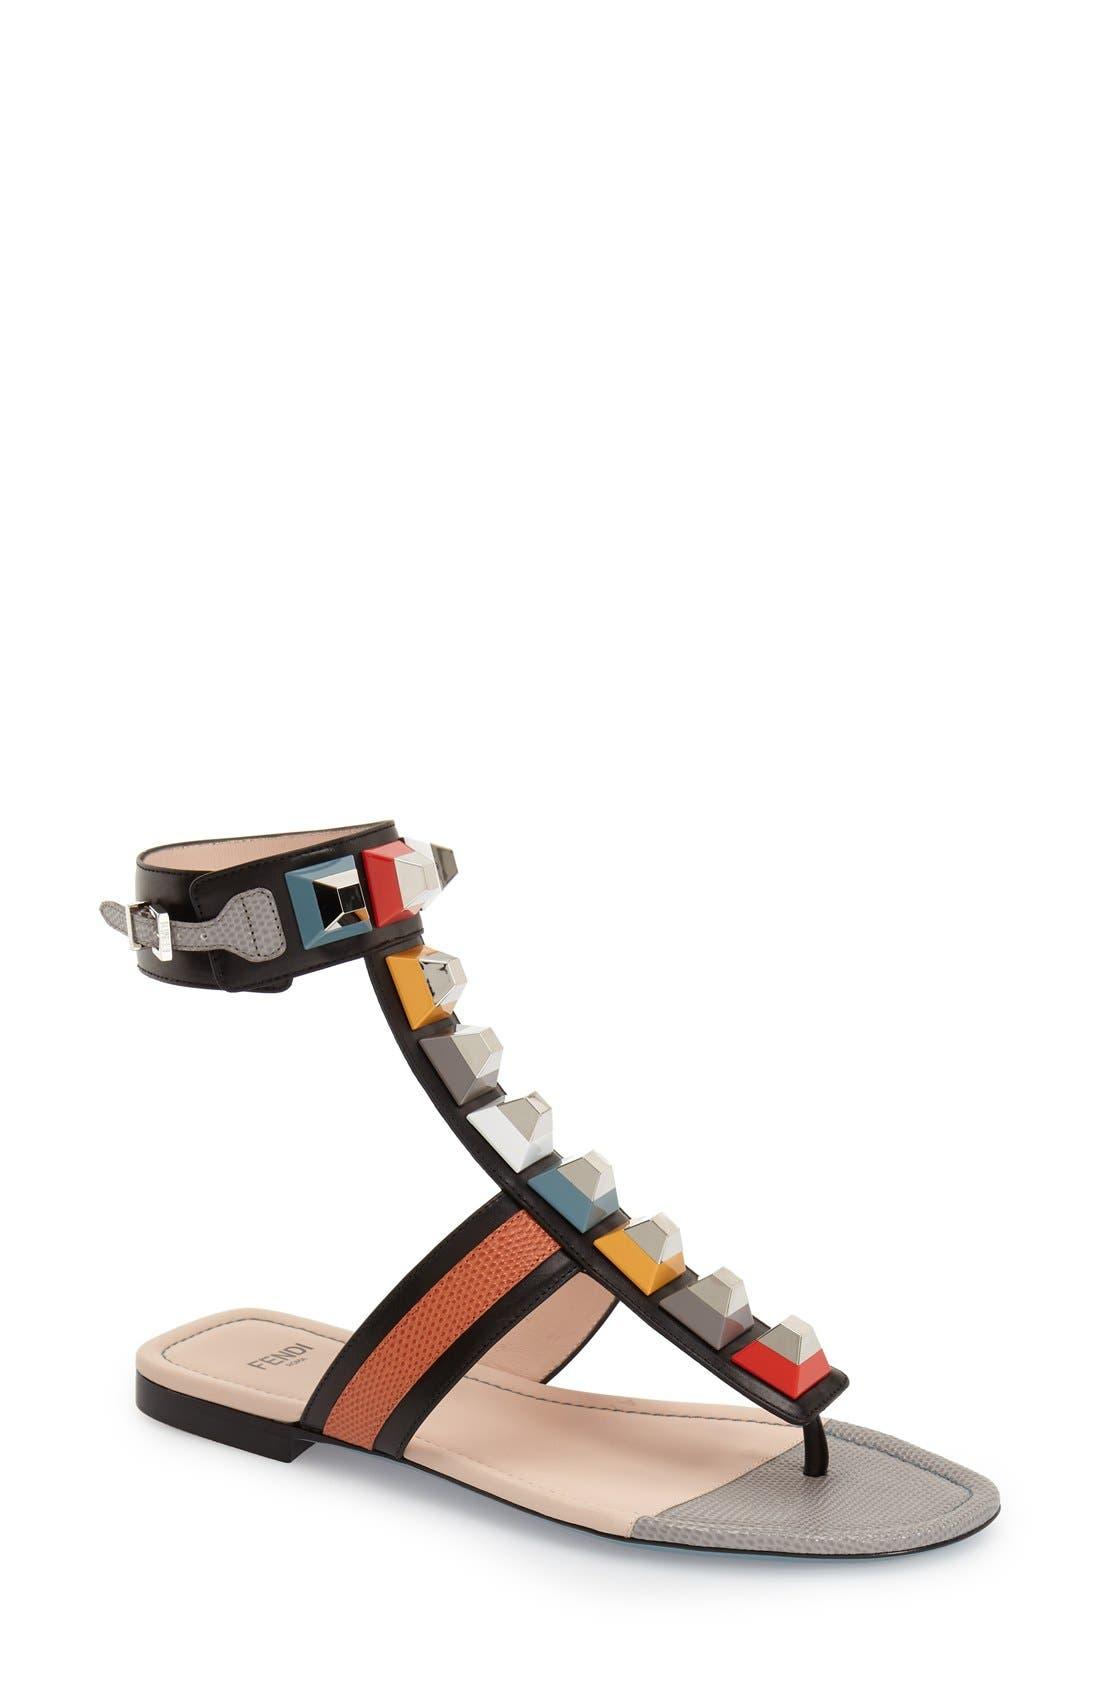 Alternate Image 1 Selected - Fendi 'Rainbow' Studded Colorblock Gladiator Sandal (Women)